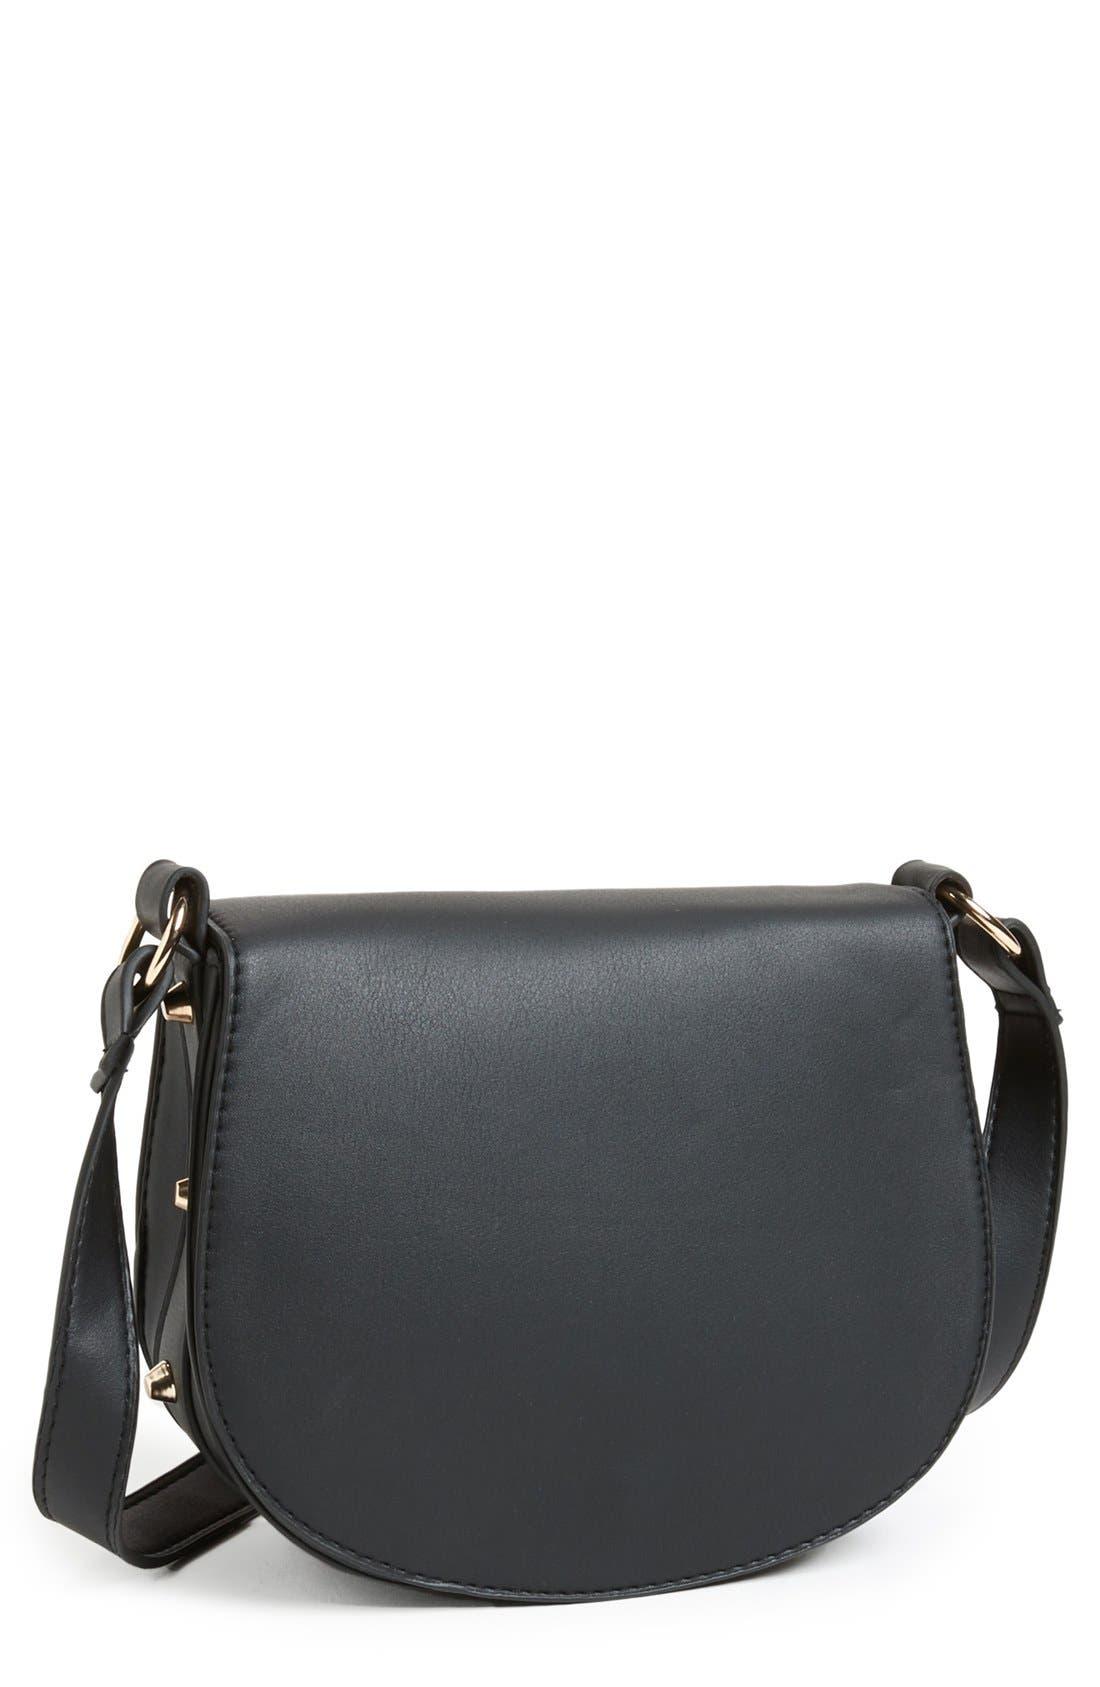 Alternate Image 1 Selected - Super Trader Studded Crossbody Bag (Juniors) (Online Only)